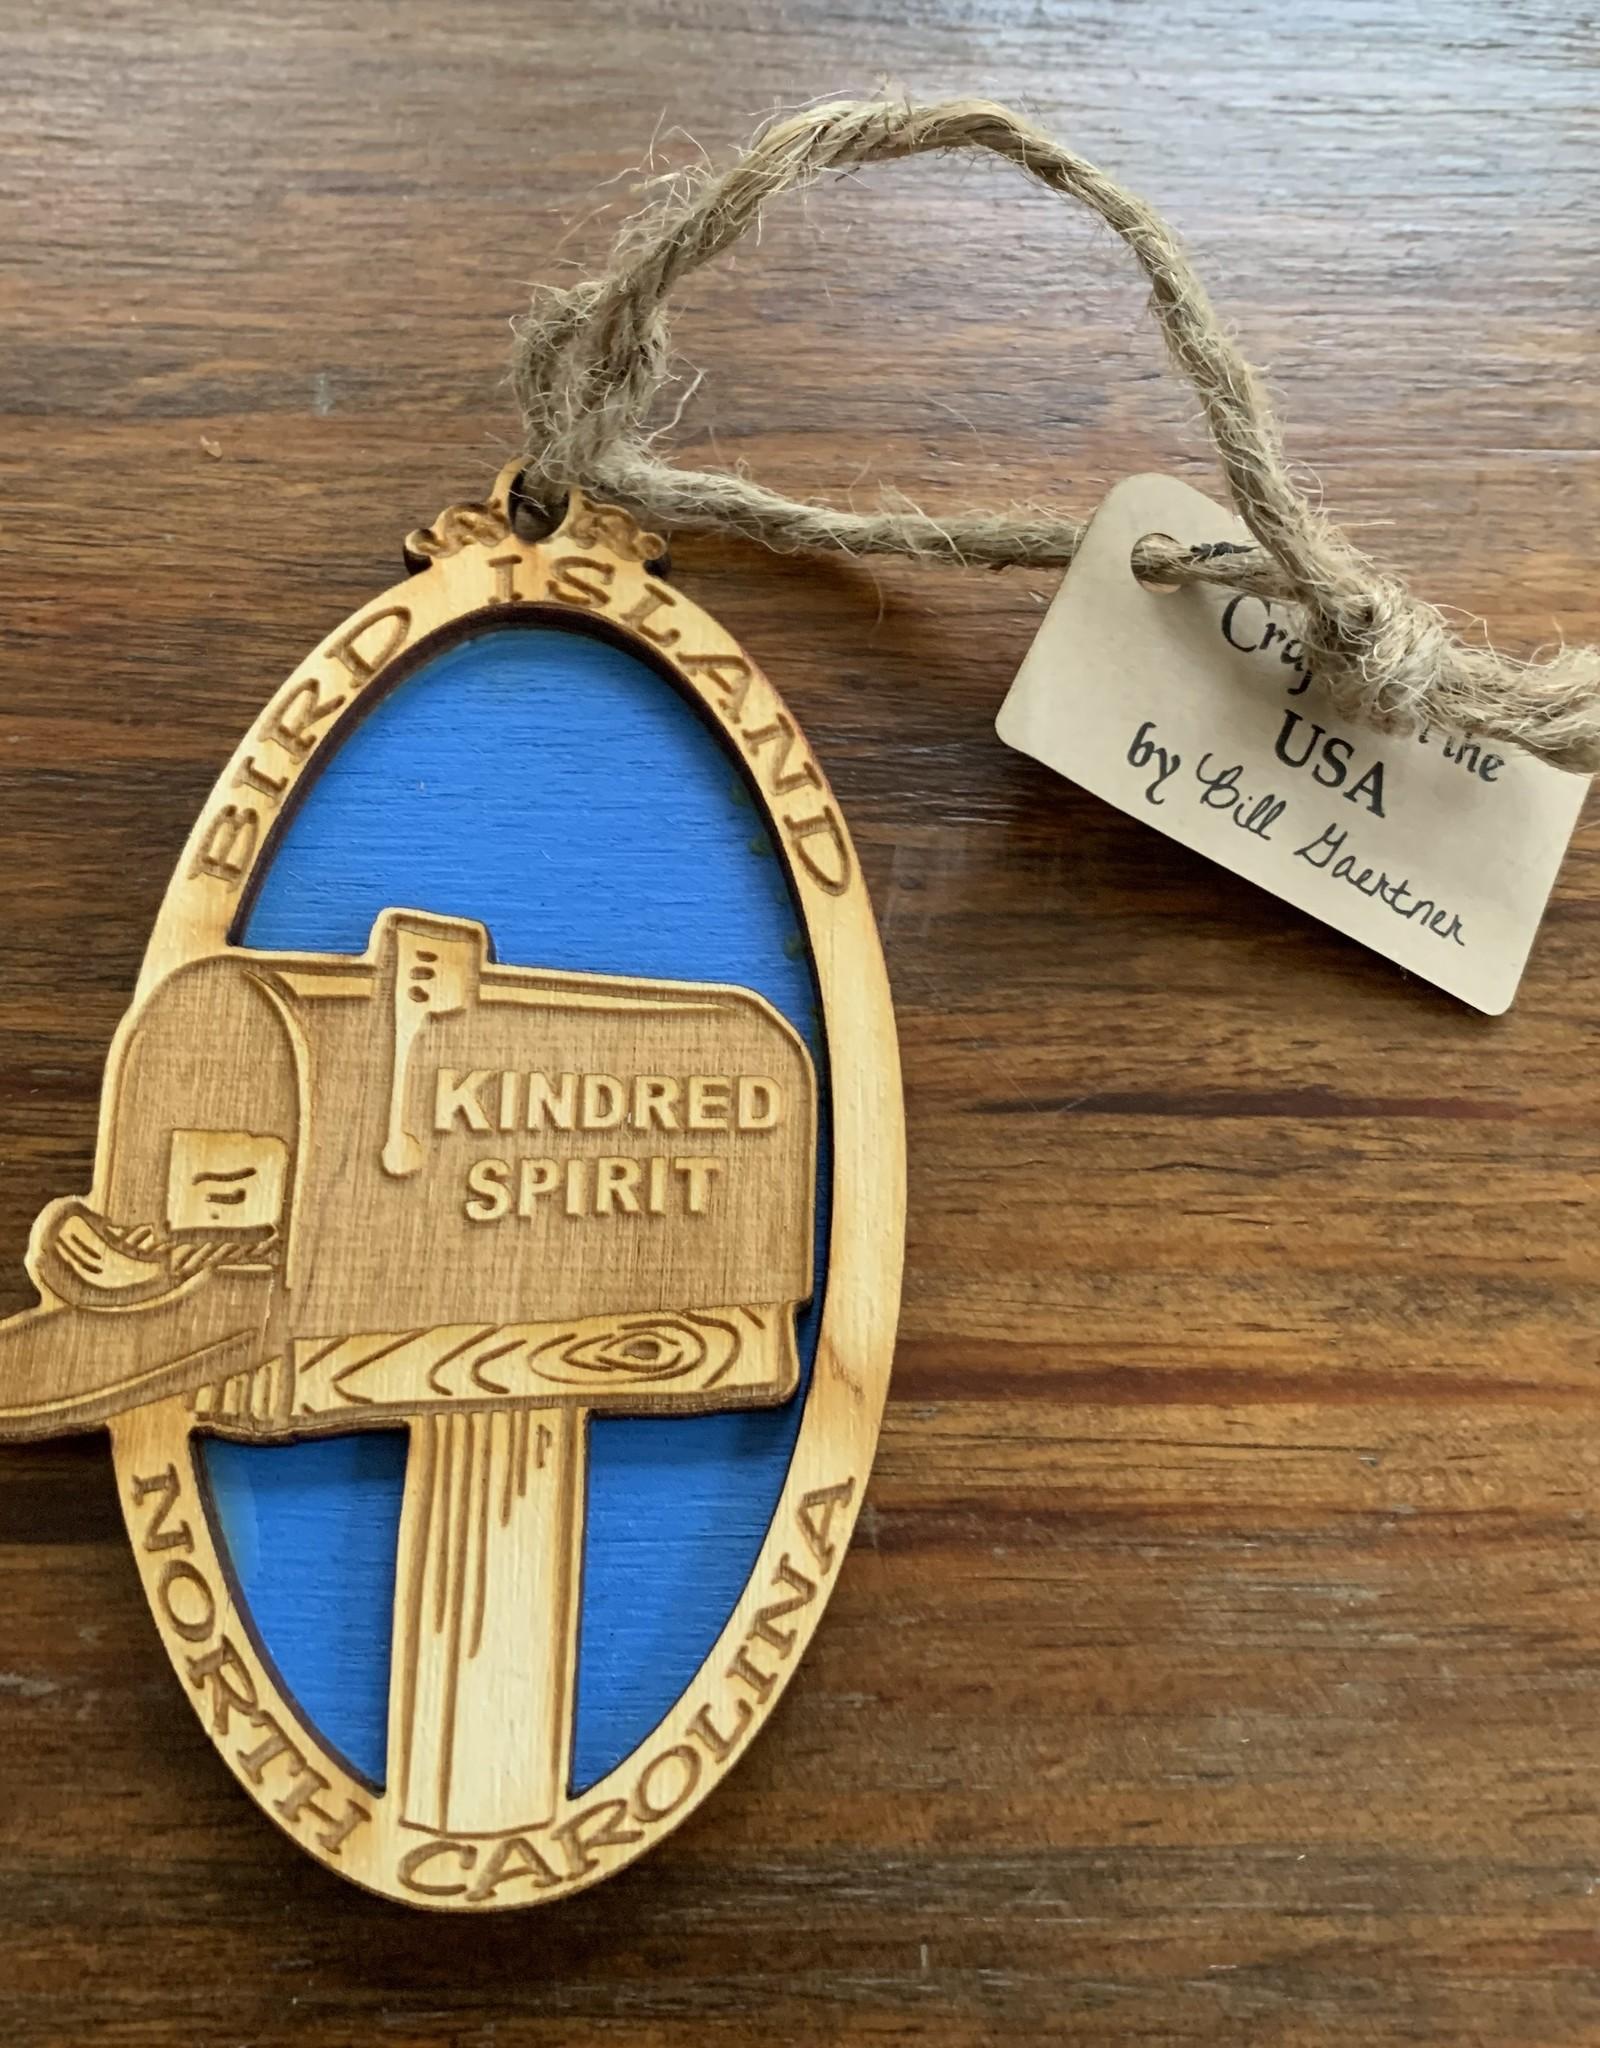 KINDRED SPIRIT KINDRED SPIRIT OVAL BILEVEL ORNAMENT (ROYAL)